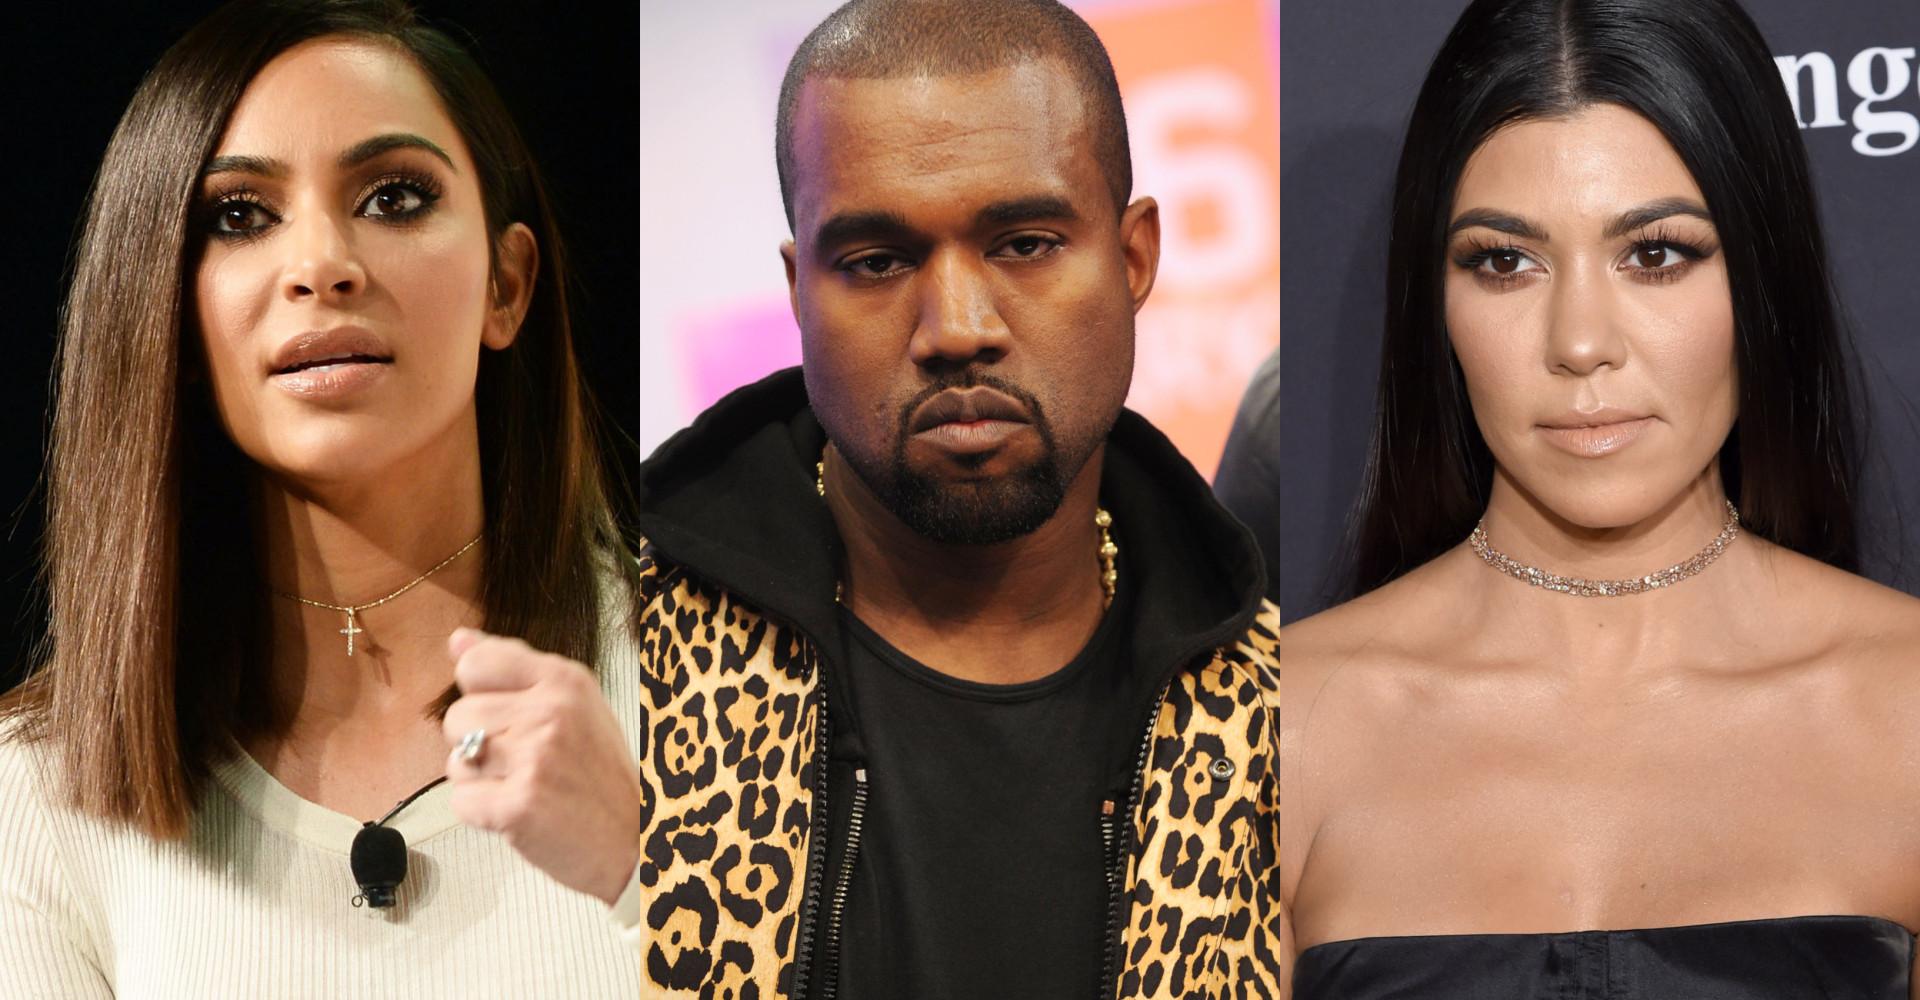 Kourtney Kardashian blasts Kanye's Yeezy designs in the most hilarious way